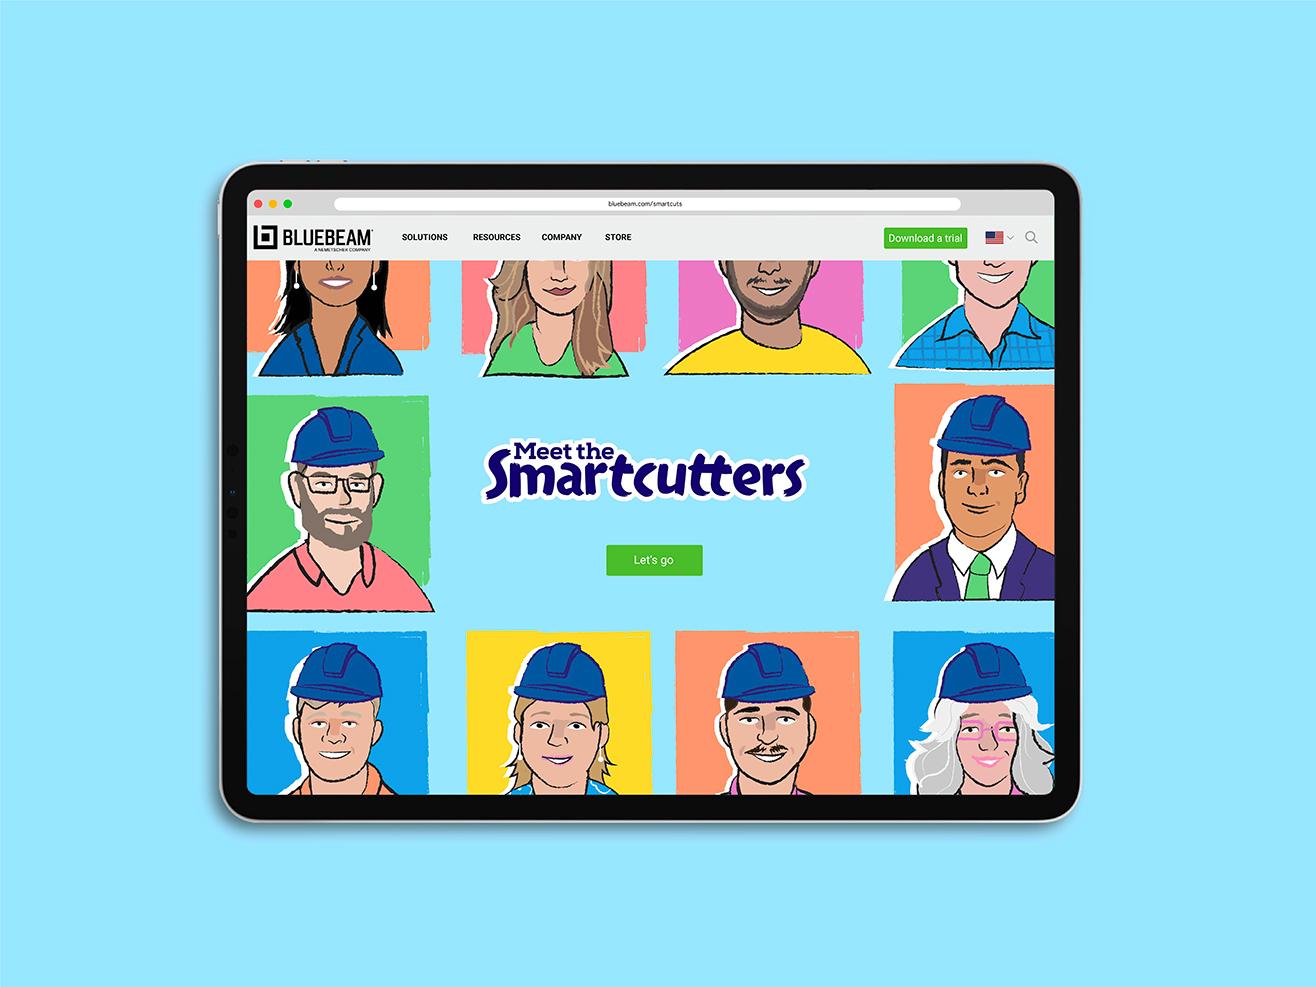 Bluebeam smartcuts website